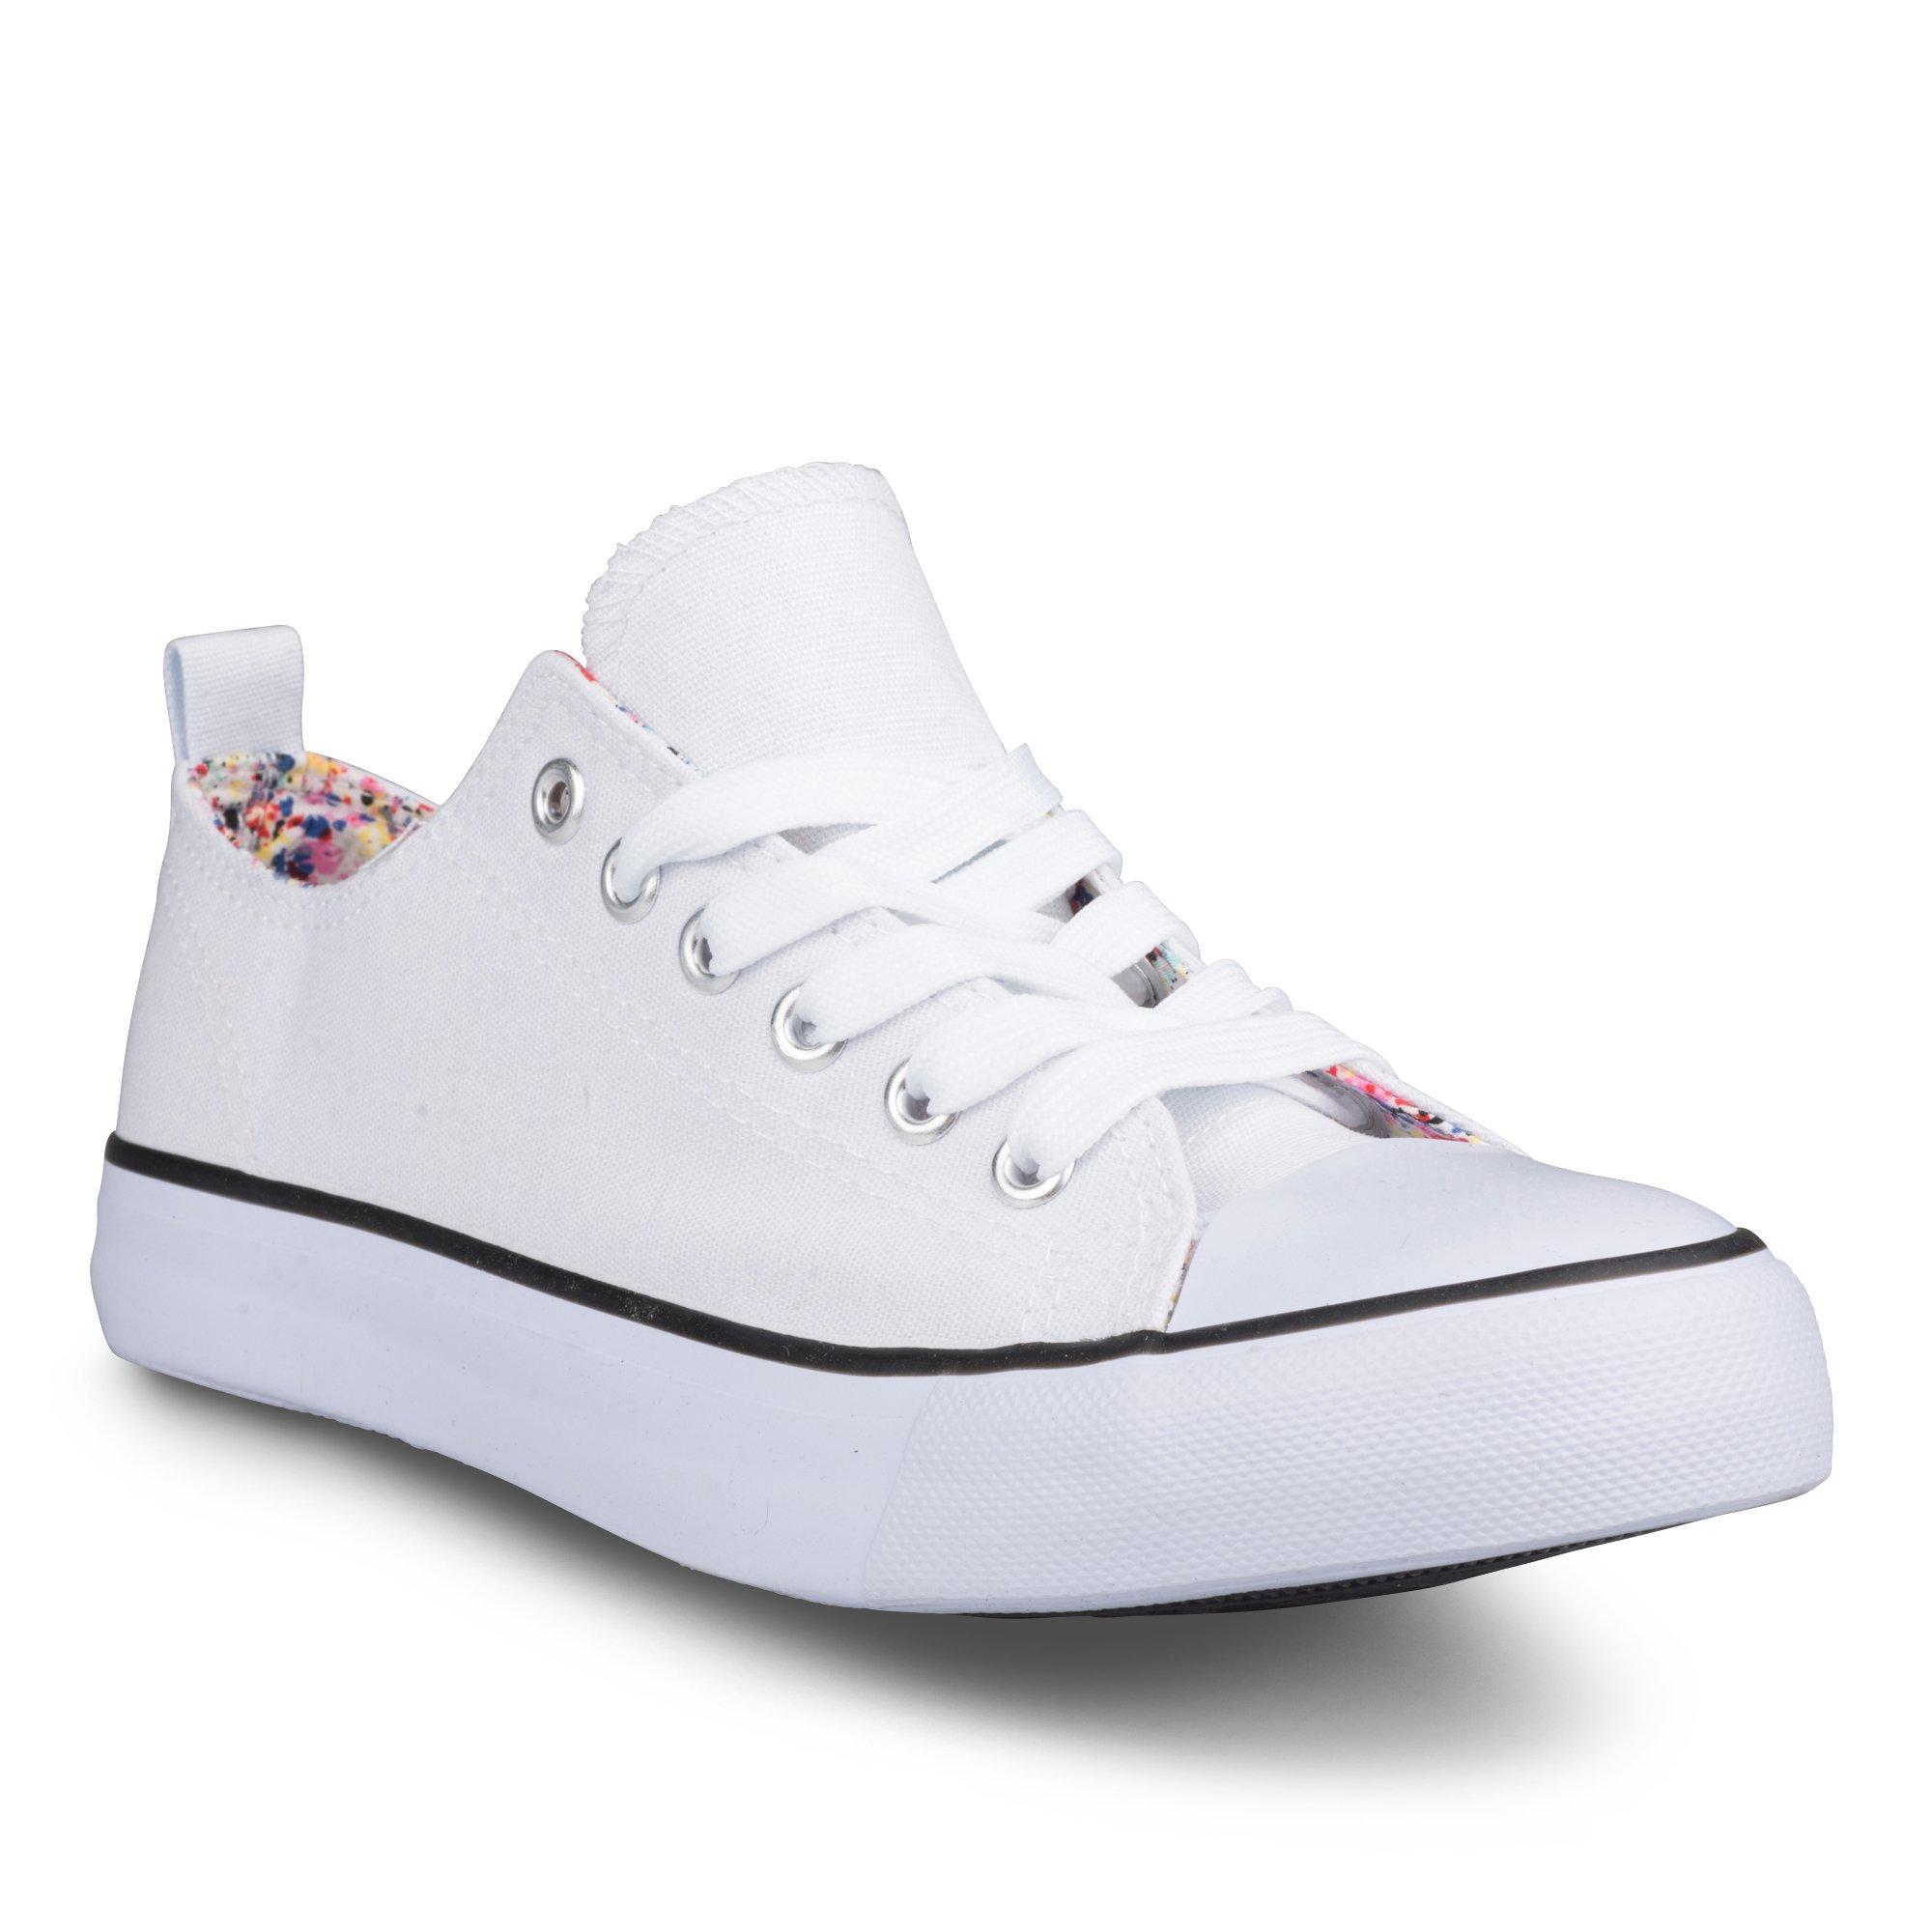 Twisted Women's Kix Printed Double Tongue Fashion Sneaker - KIXDT06 White, Size 9